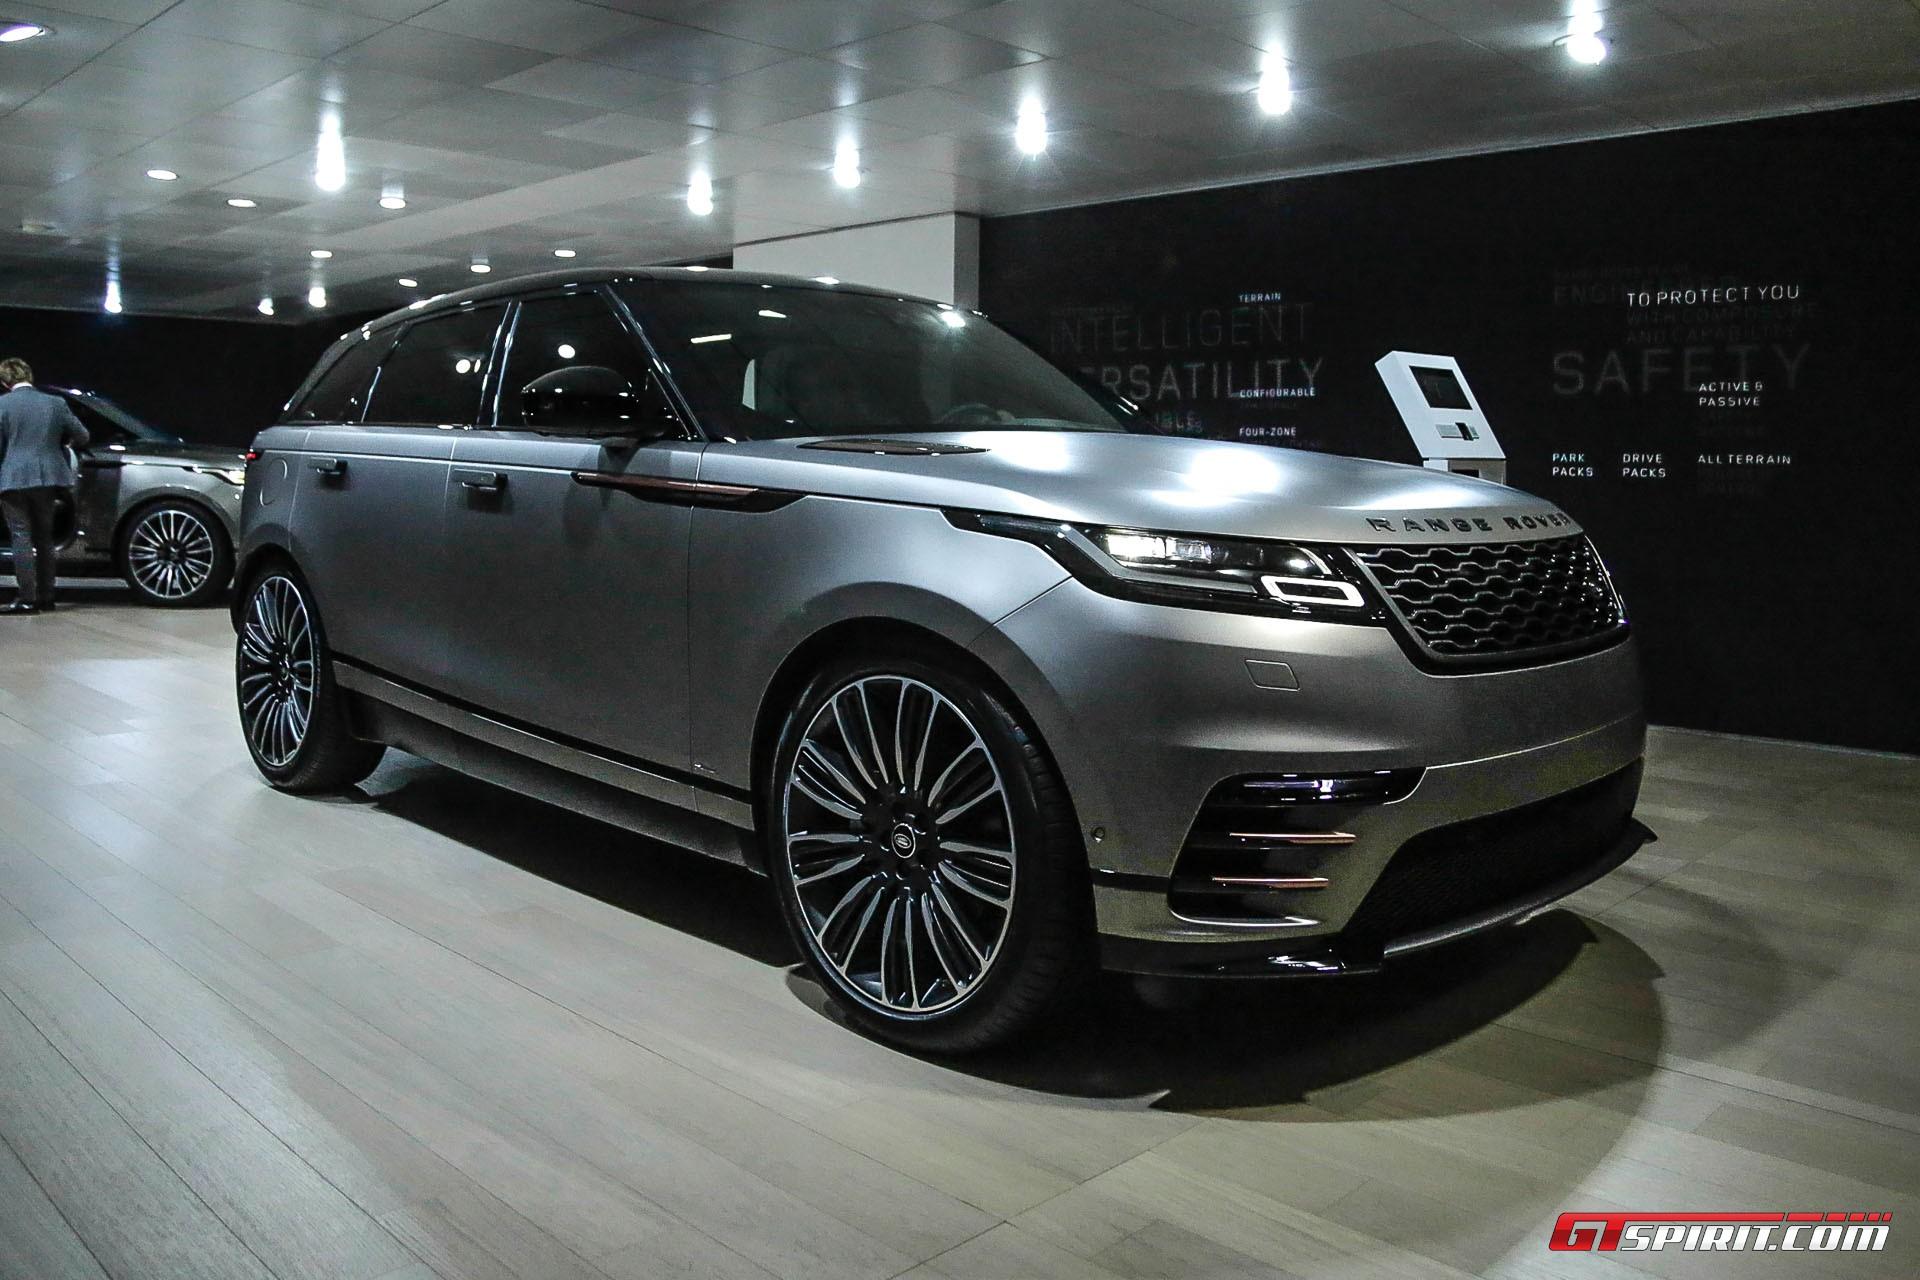 Geneva 2017 Range Rover Velar GTspirit